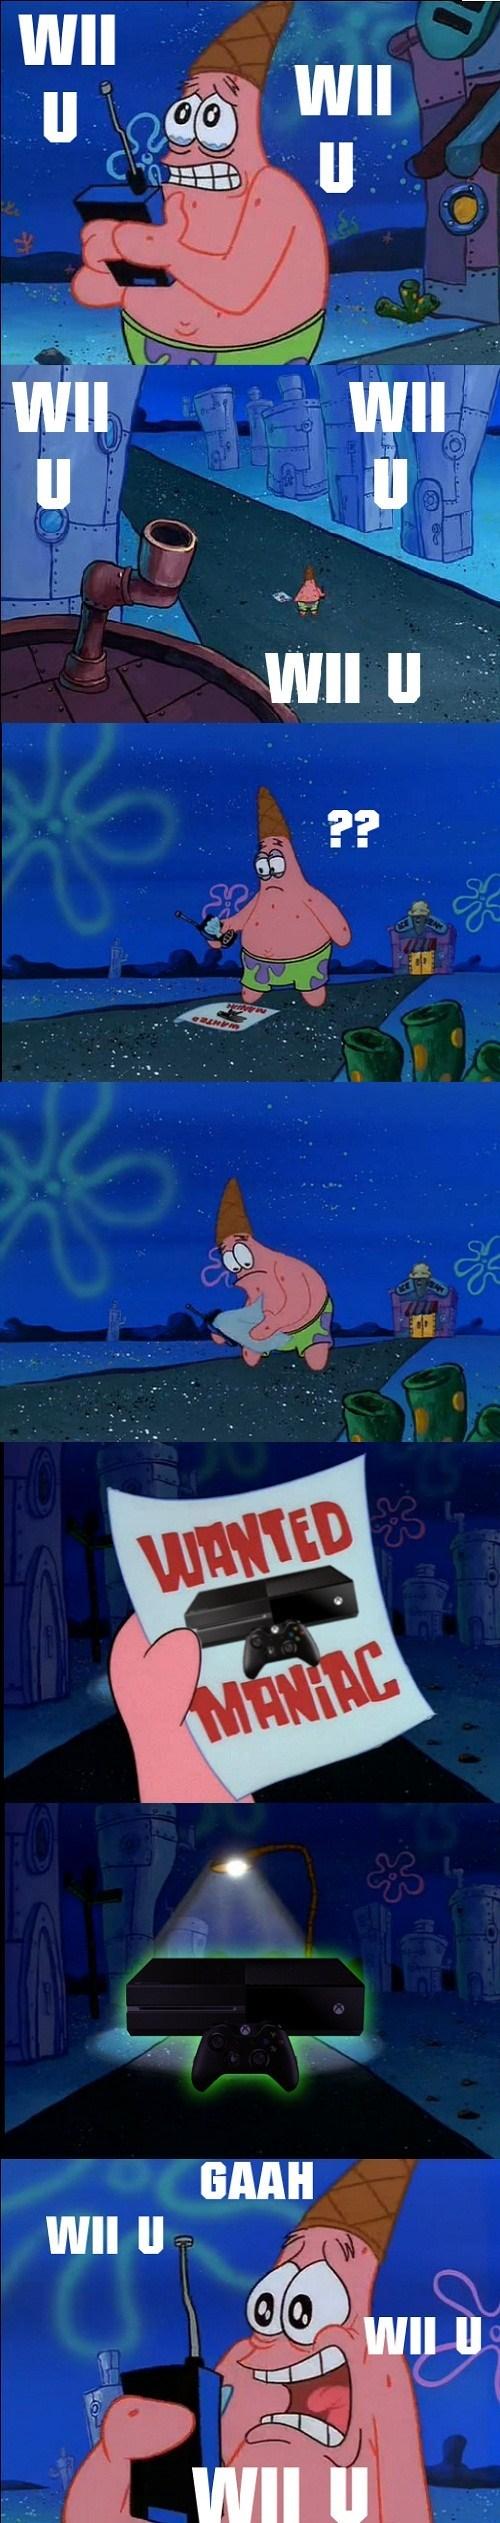 wii U SpongeBob SquarePants xbox one E32013 - 7566109184